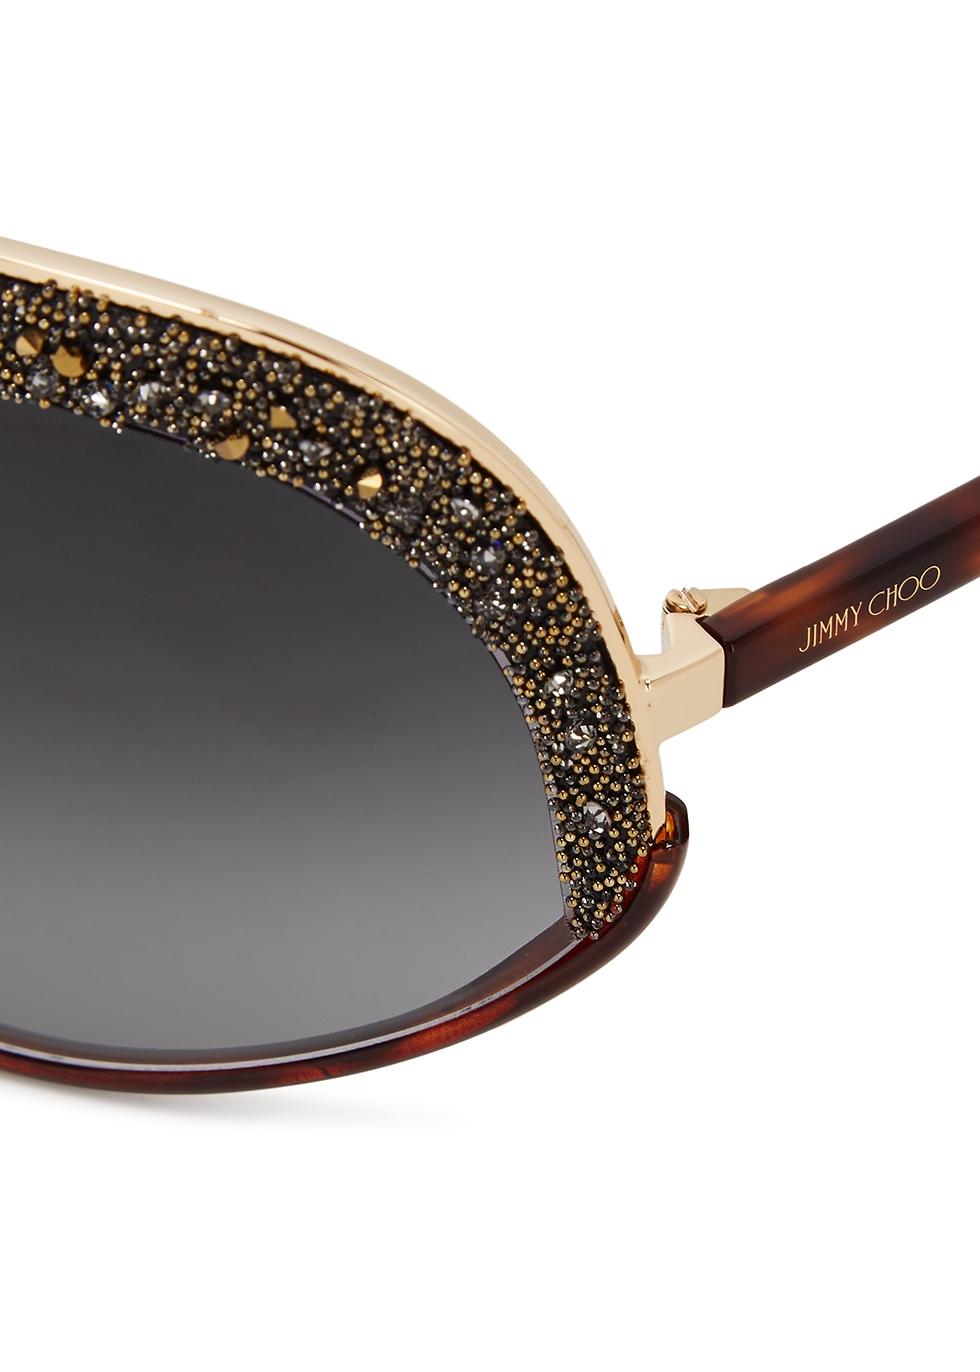 Siryn tortoiseshell wrap-around sunglasses - Jimmy Choo